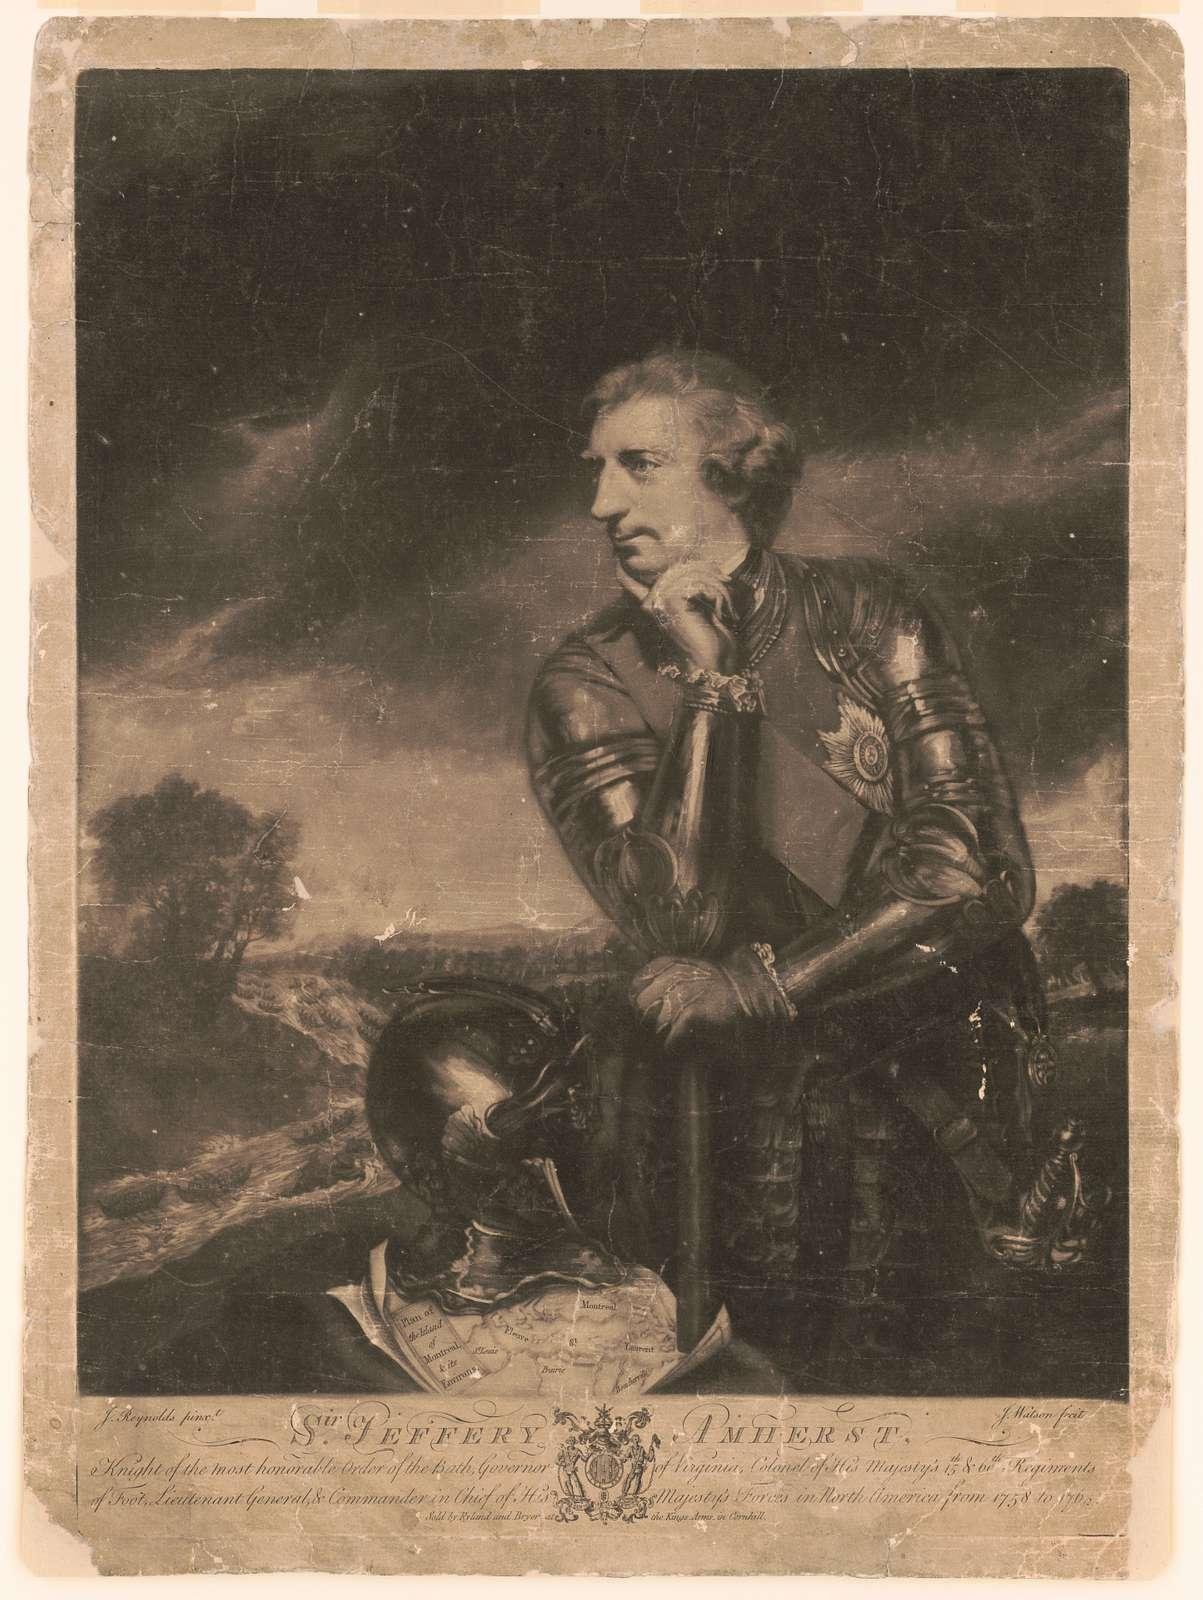 Sir Jeffery Amherst Knight of the most honorable Order of Bath, ... J. Reynolds pinxt. ; J. Watson fecit